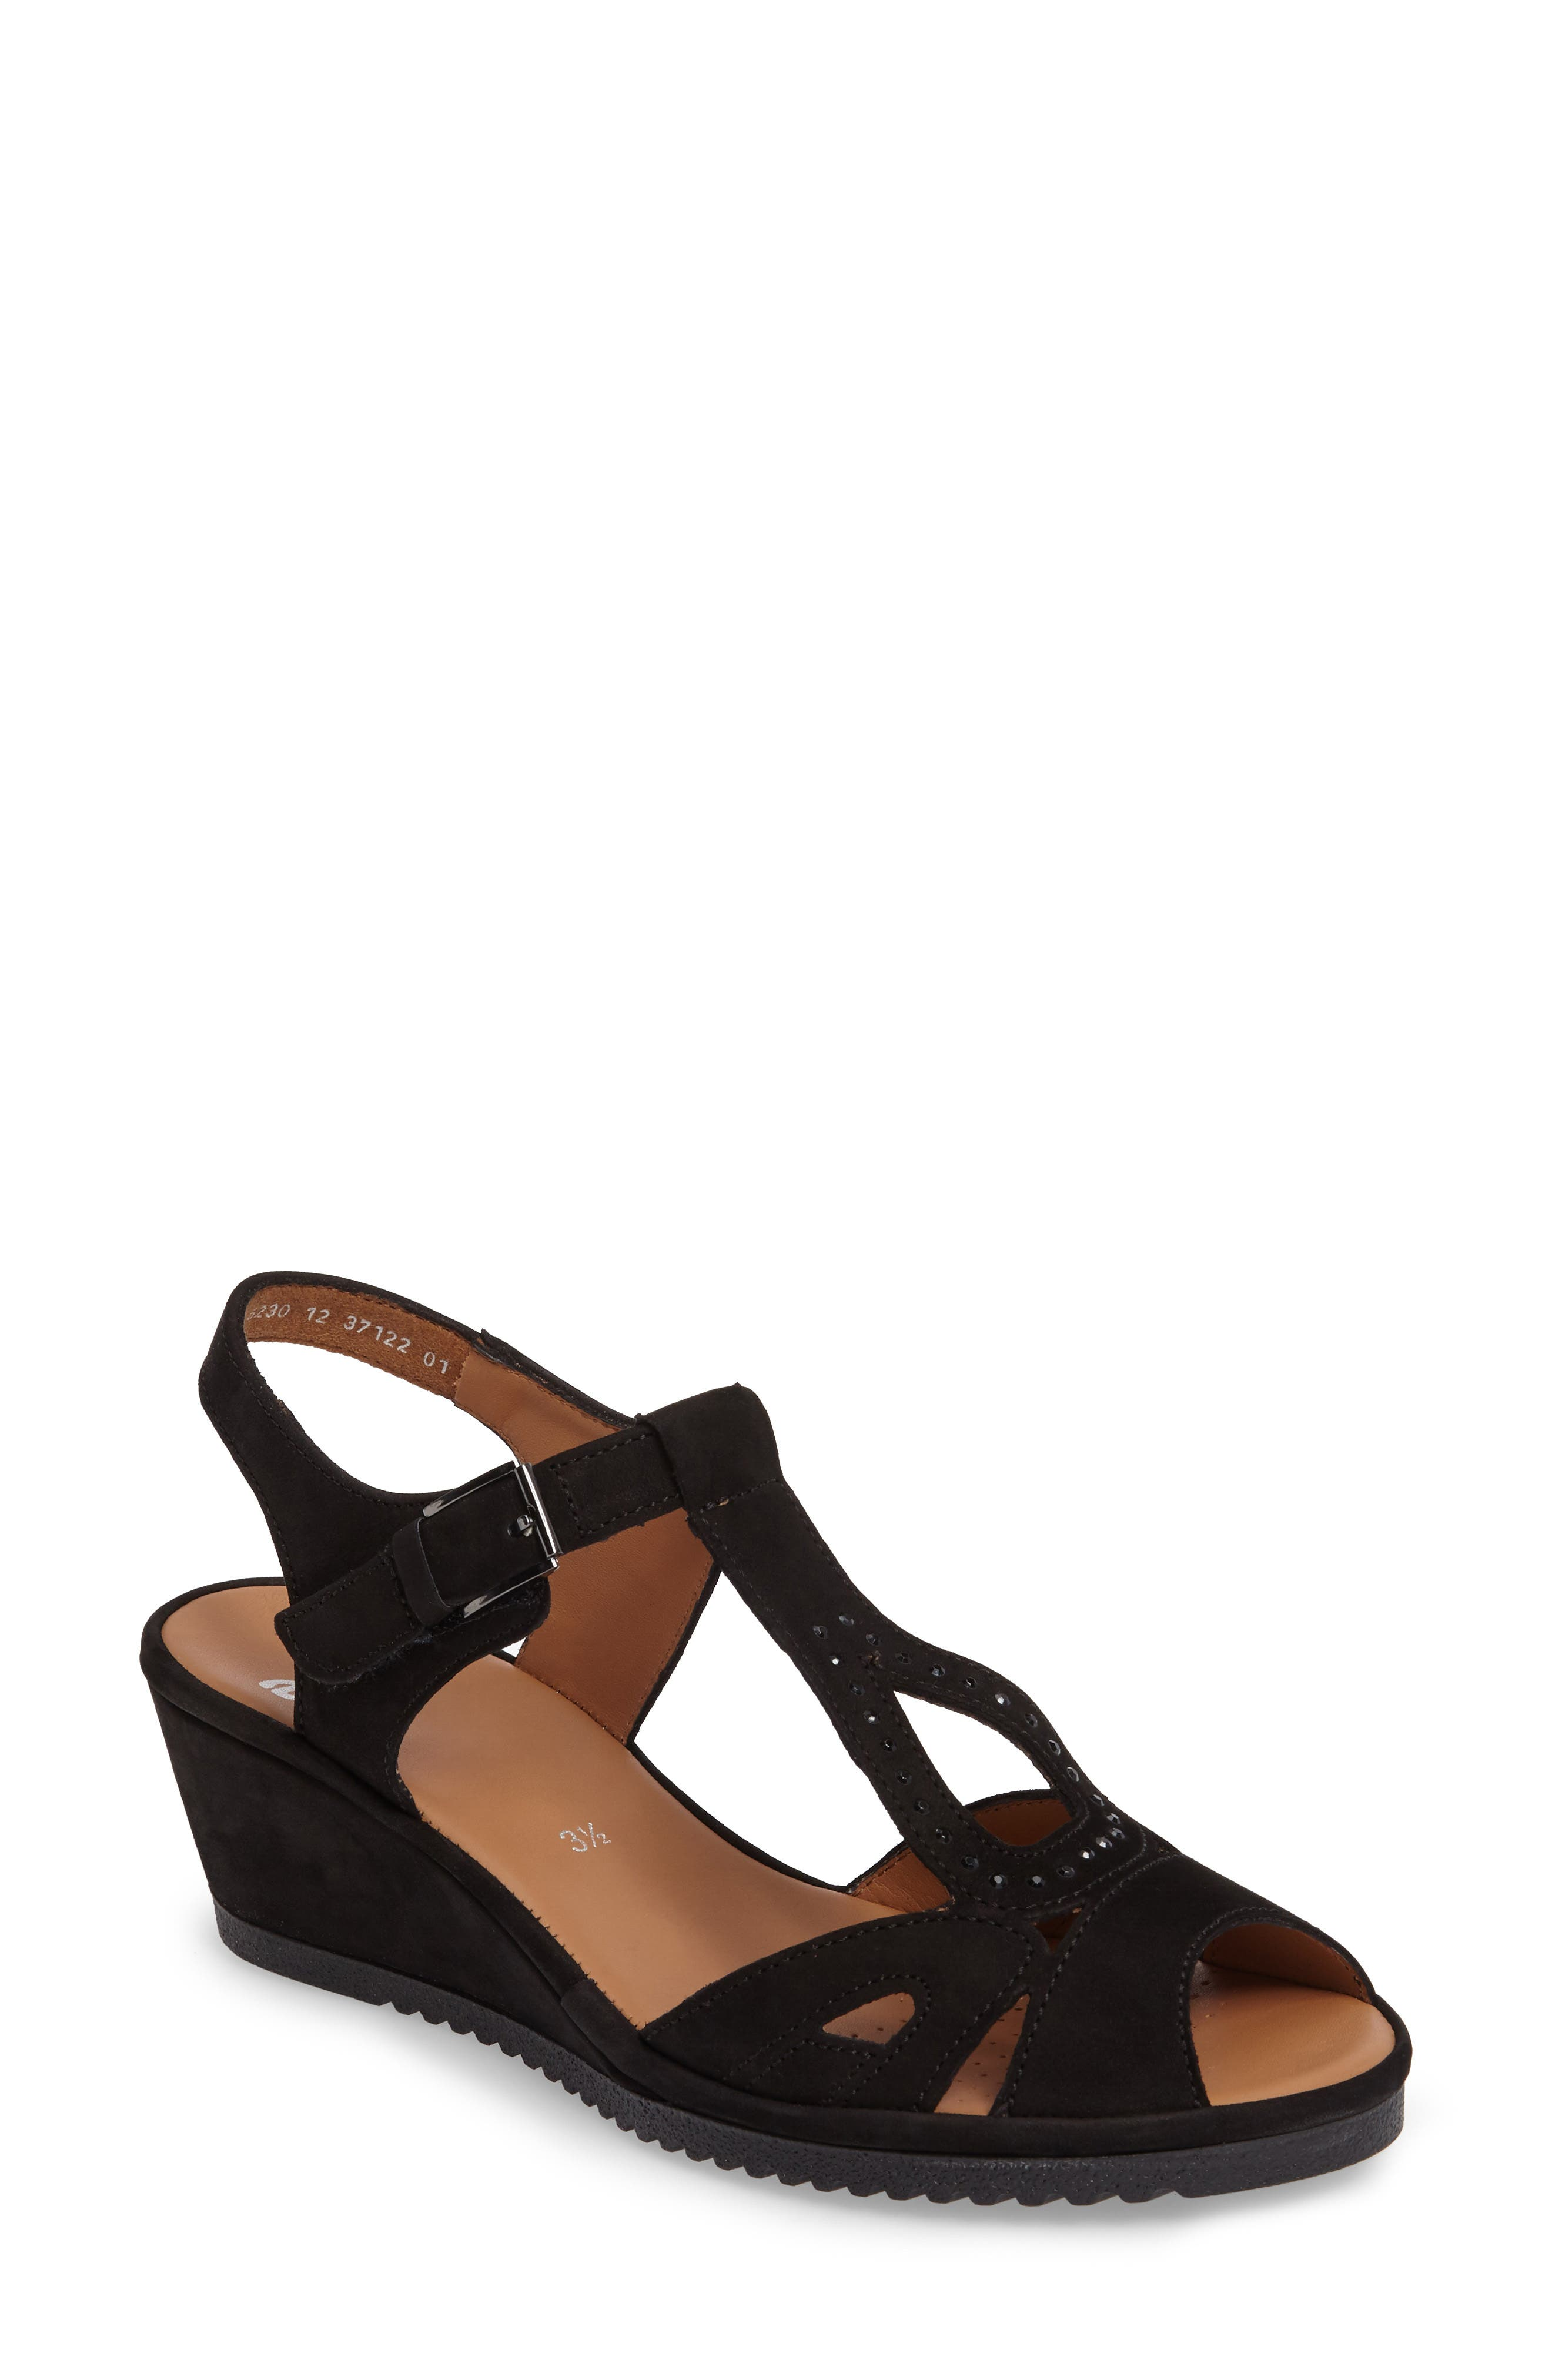 Wedge Sandal,                         Main,                         color, Black